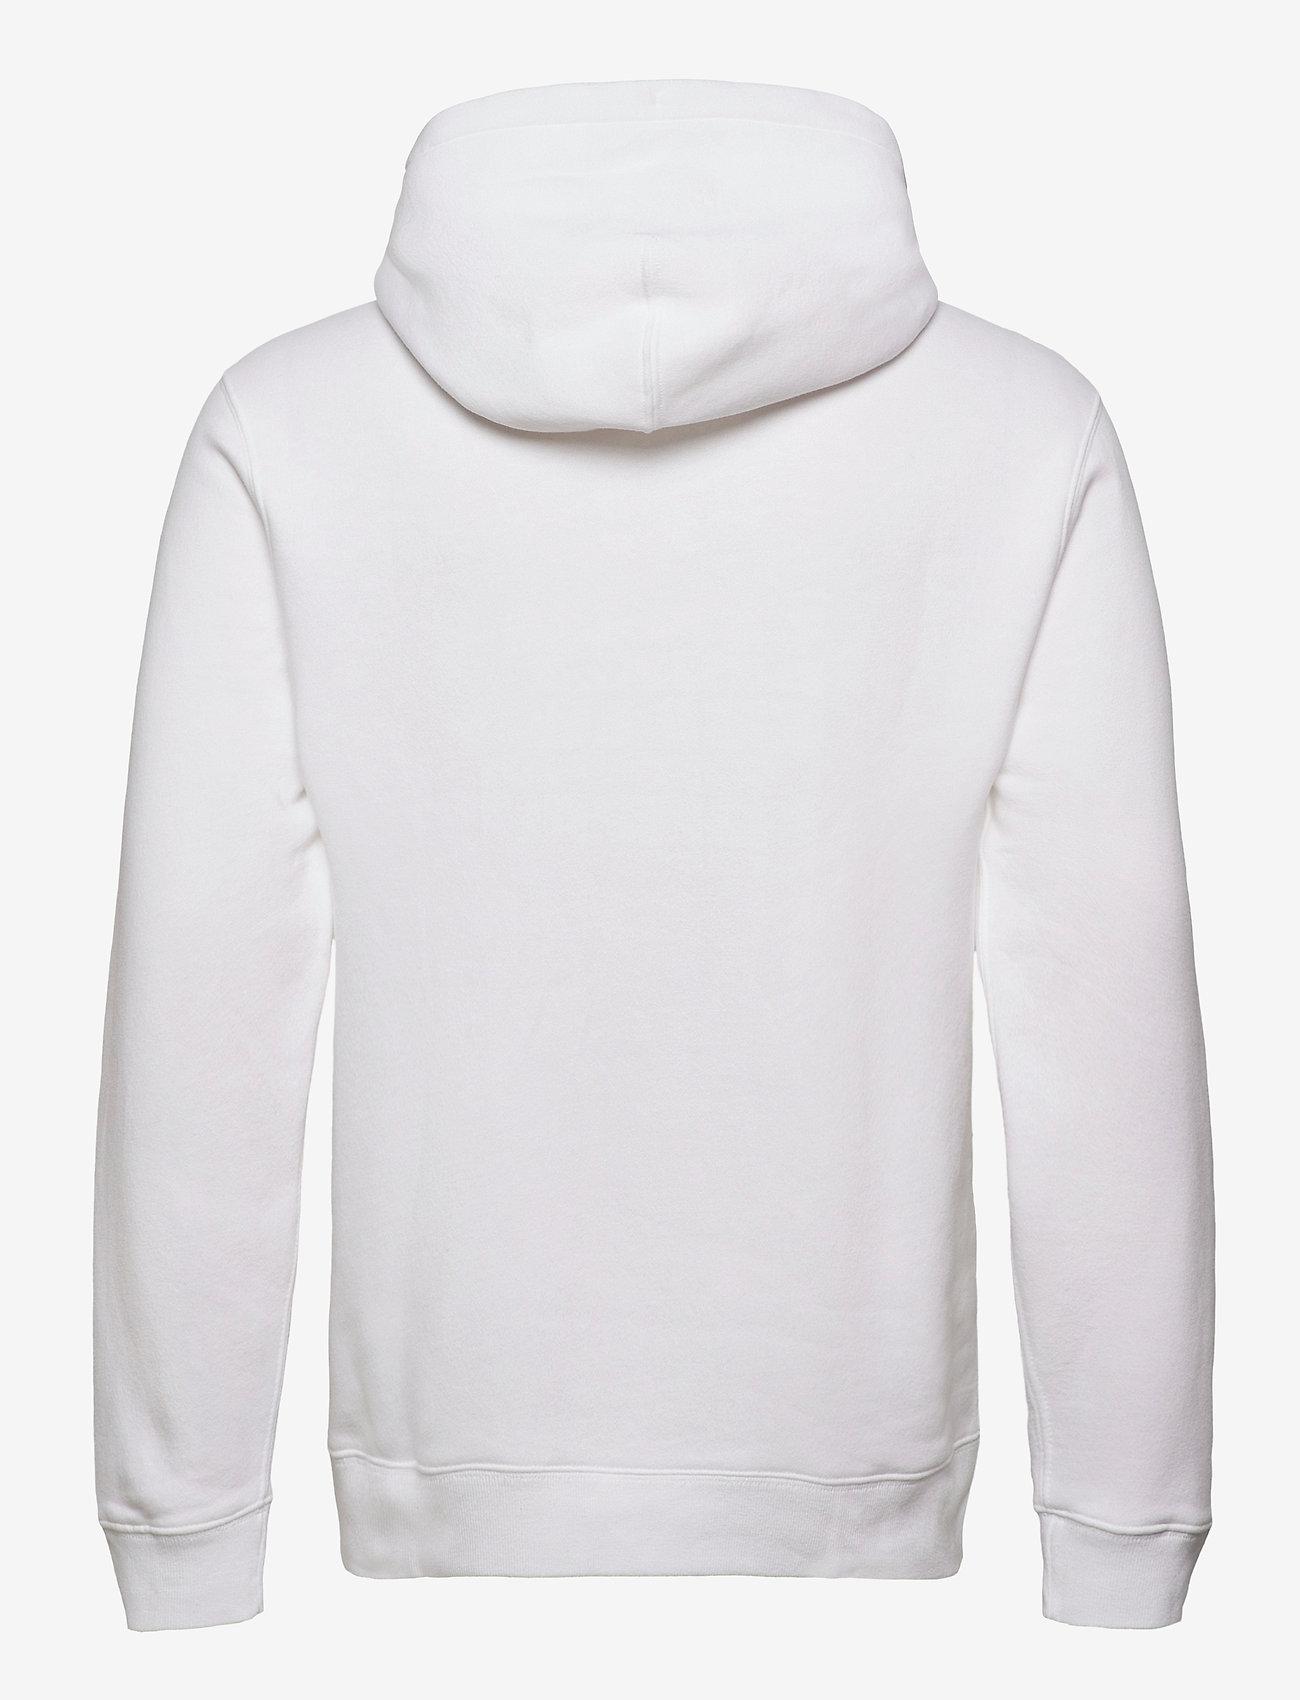 Logocon Applique (White) (56.25 €) - Abercrombie & Fitch FrWvS